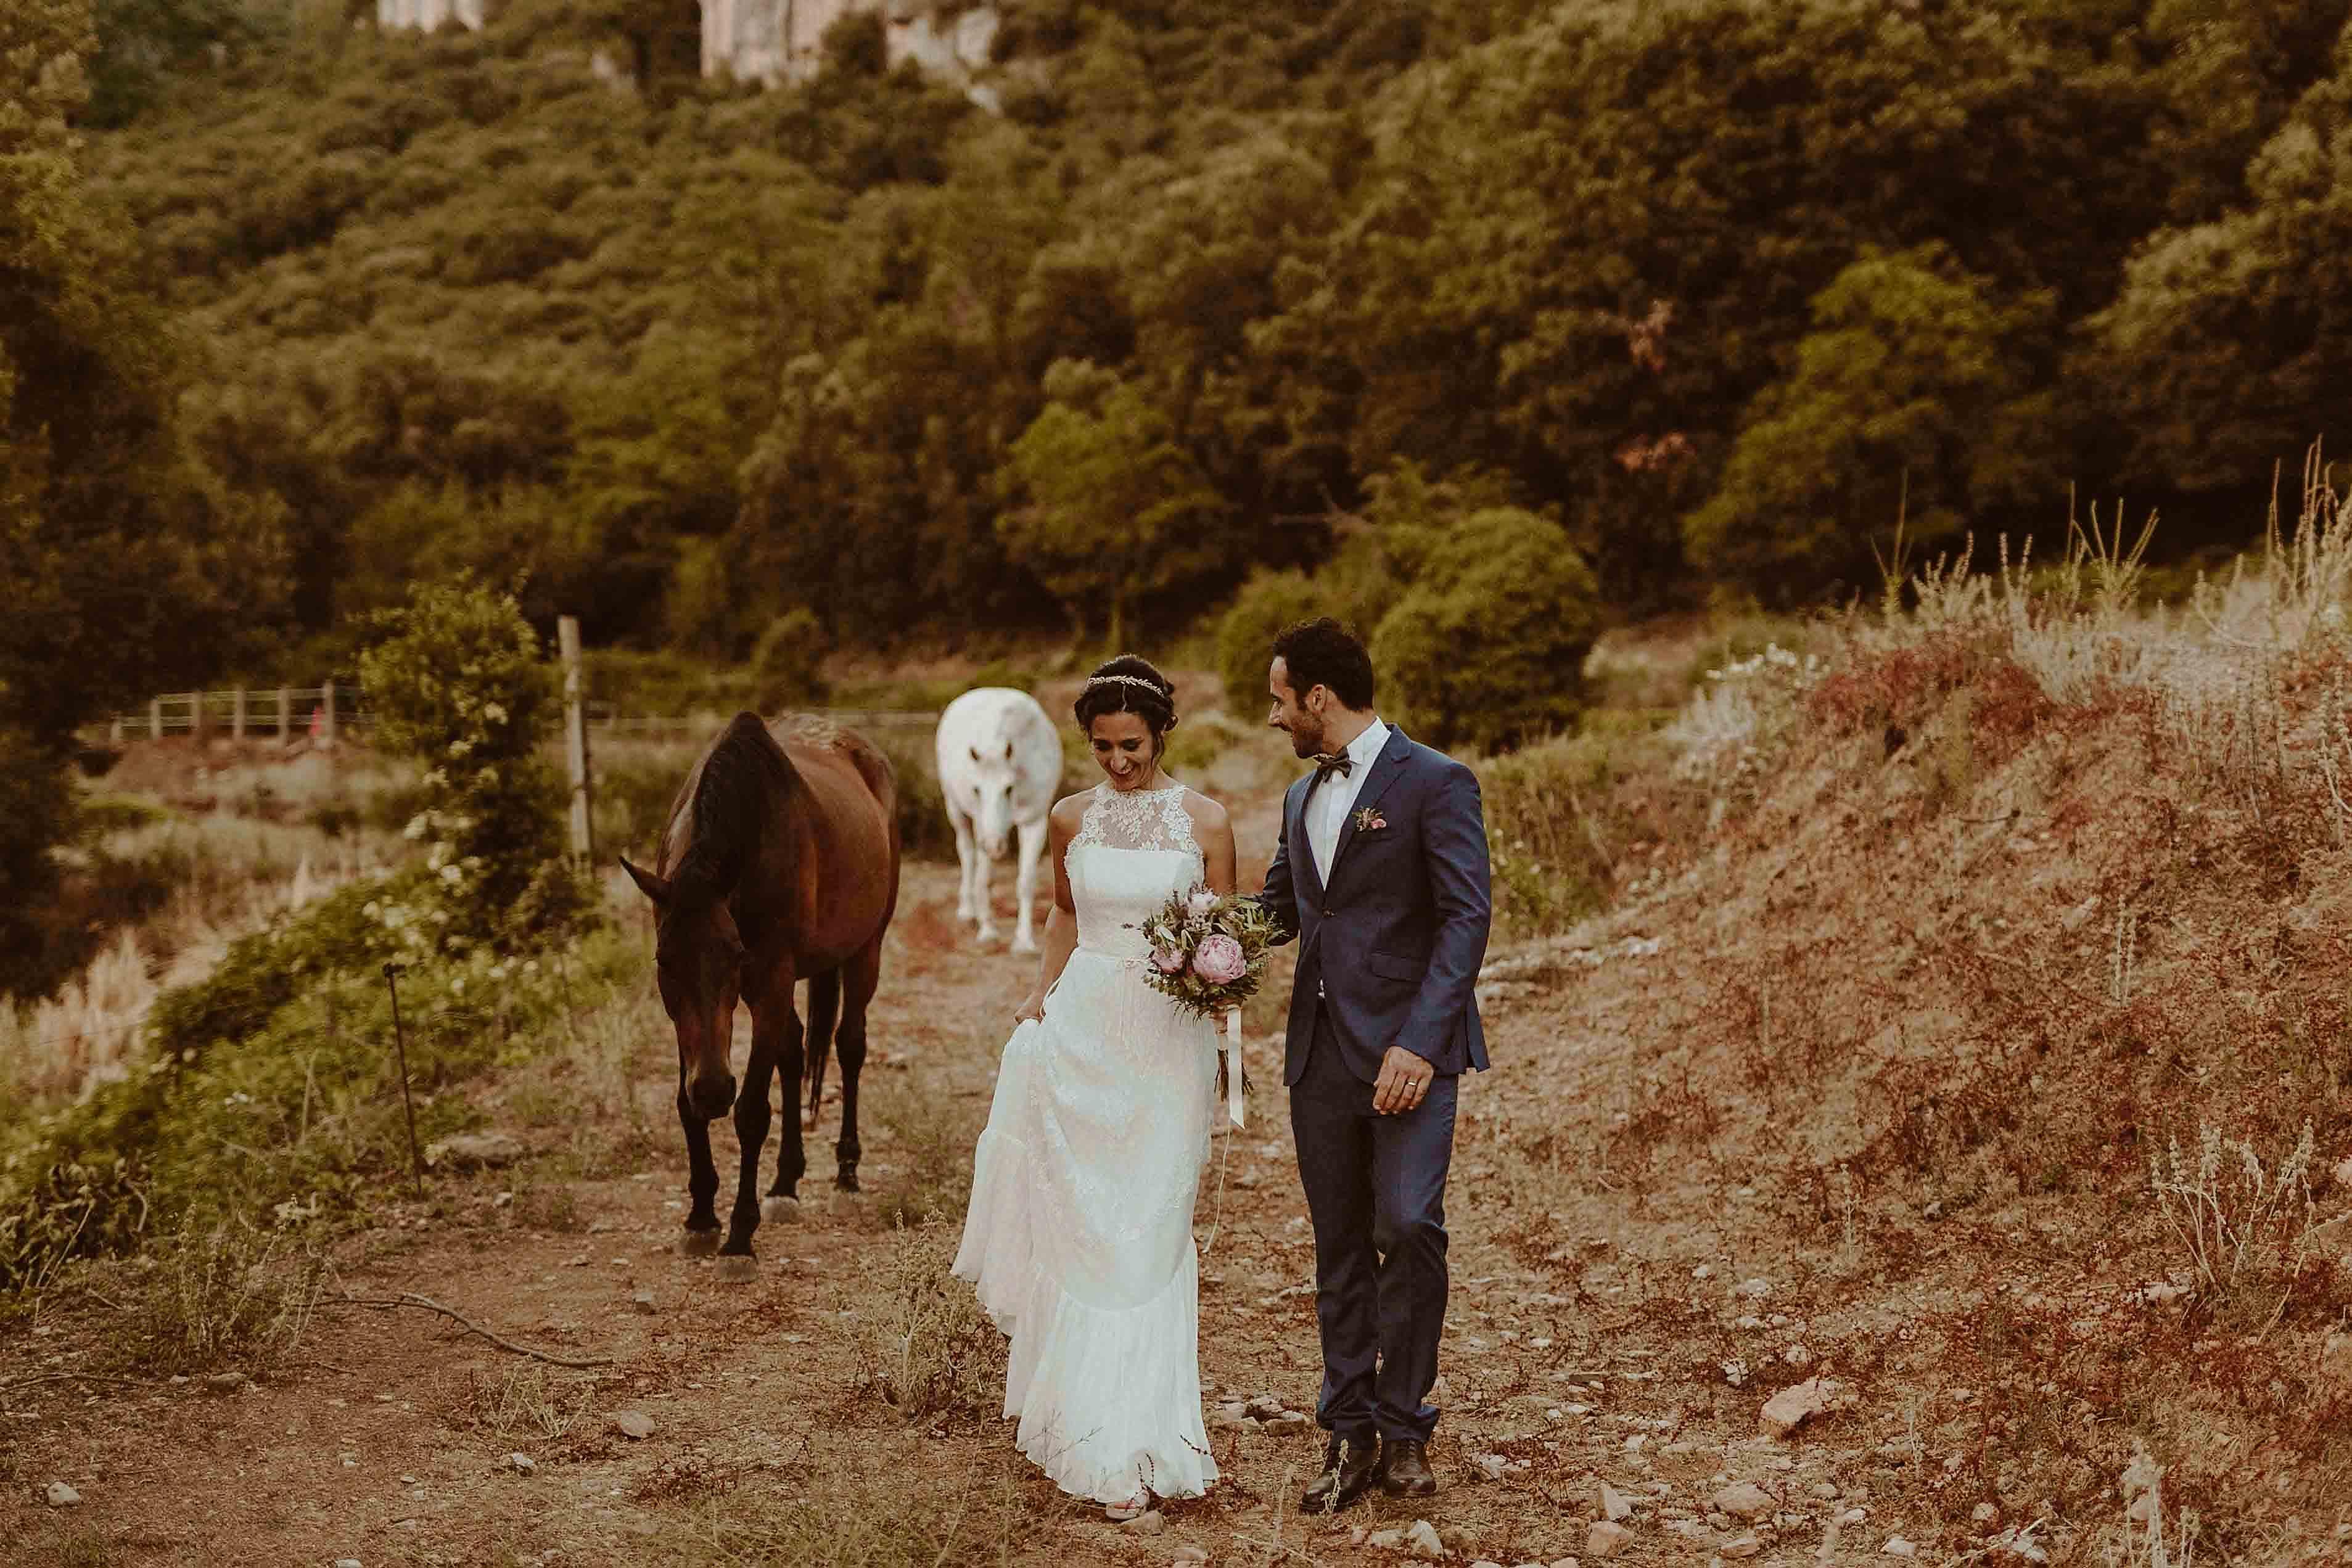 Boda rústica en la montaña. fotgrafo de bodas barcelona_091